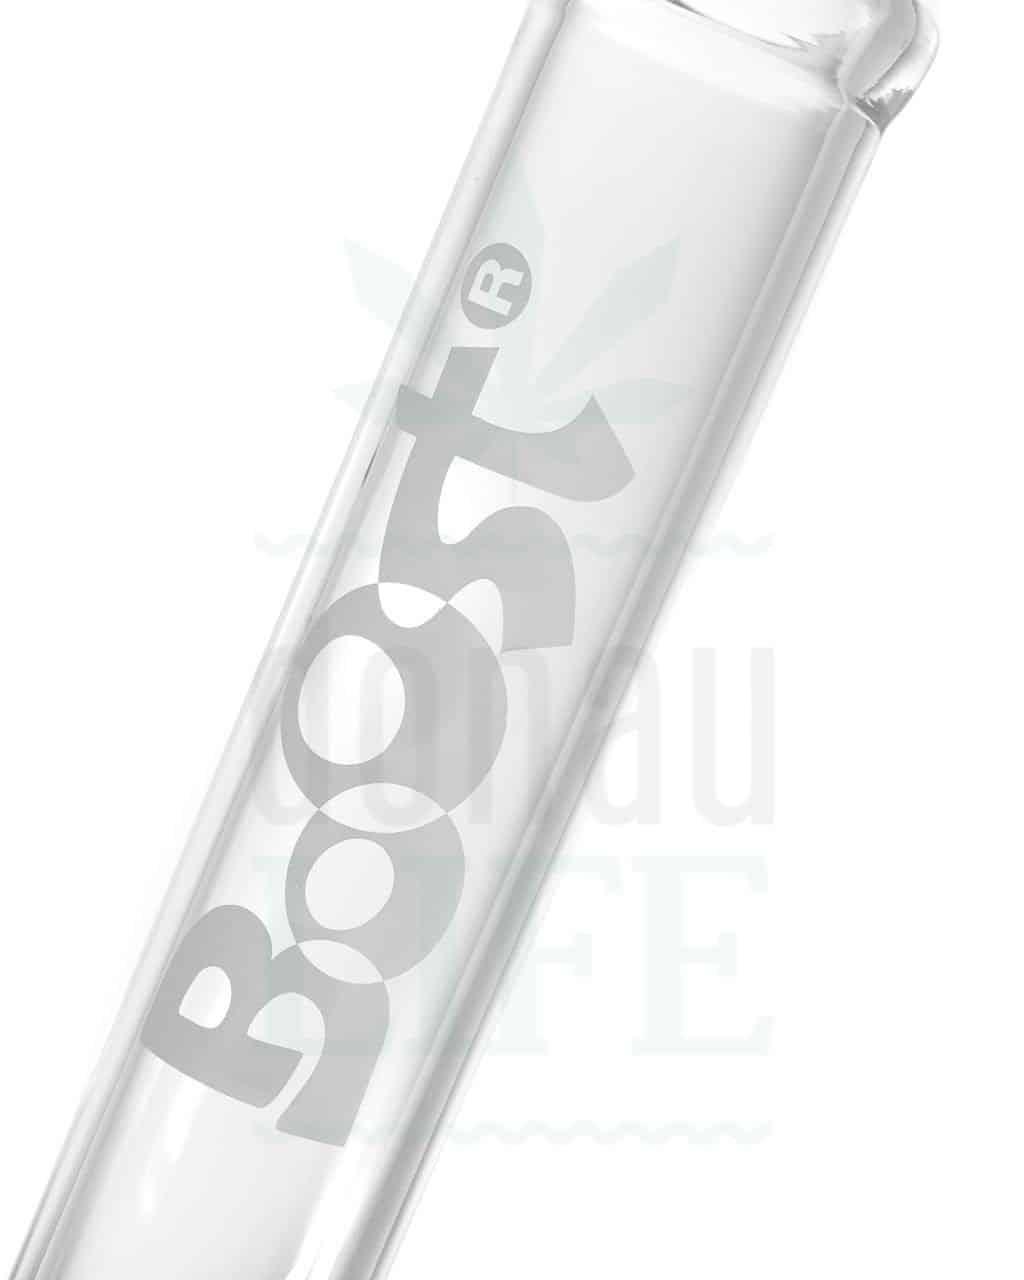 aus Glas BOOST Eisbong 'Bolt' | 49 cm